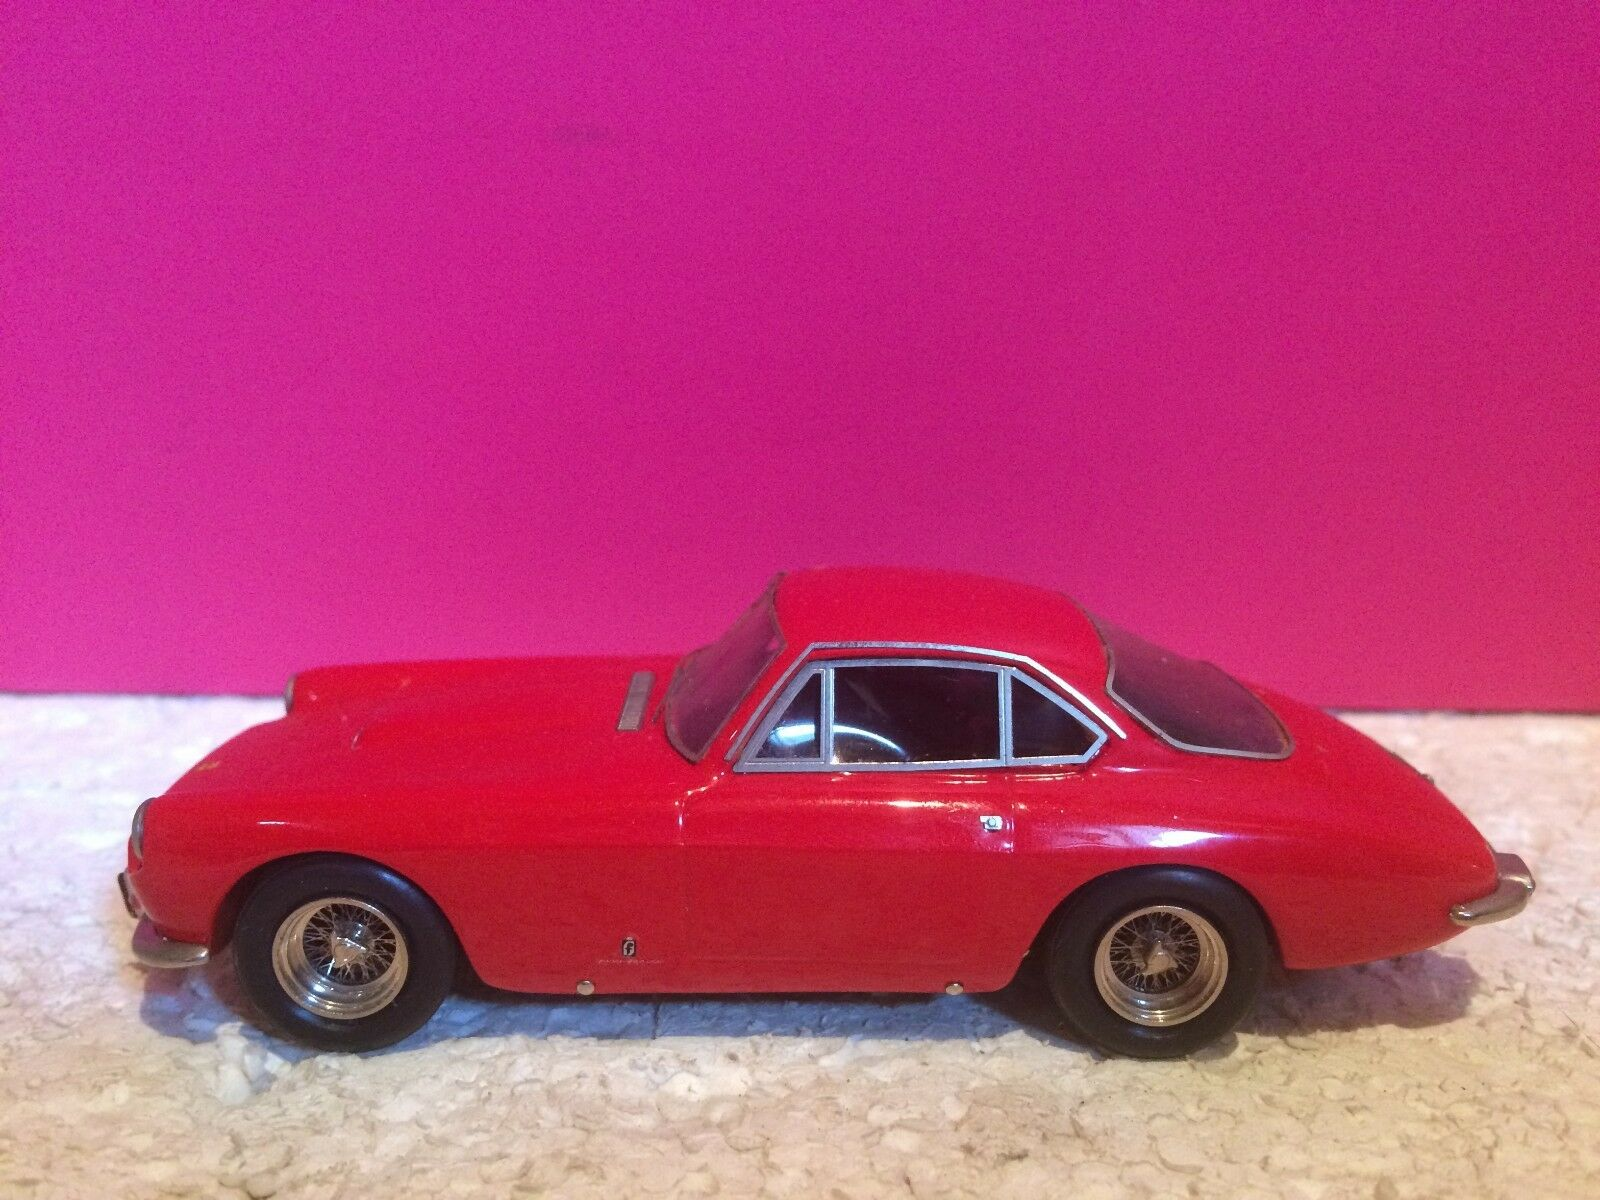 BBR SUPERBE KIT MONTÉ FERRARI 250 GT PININFARINA 1960 EN BOITE 1 43 W2